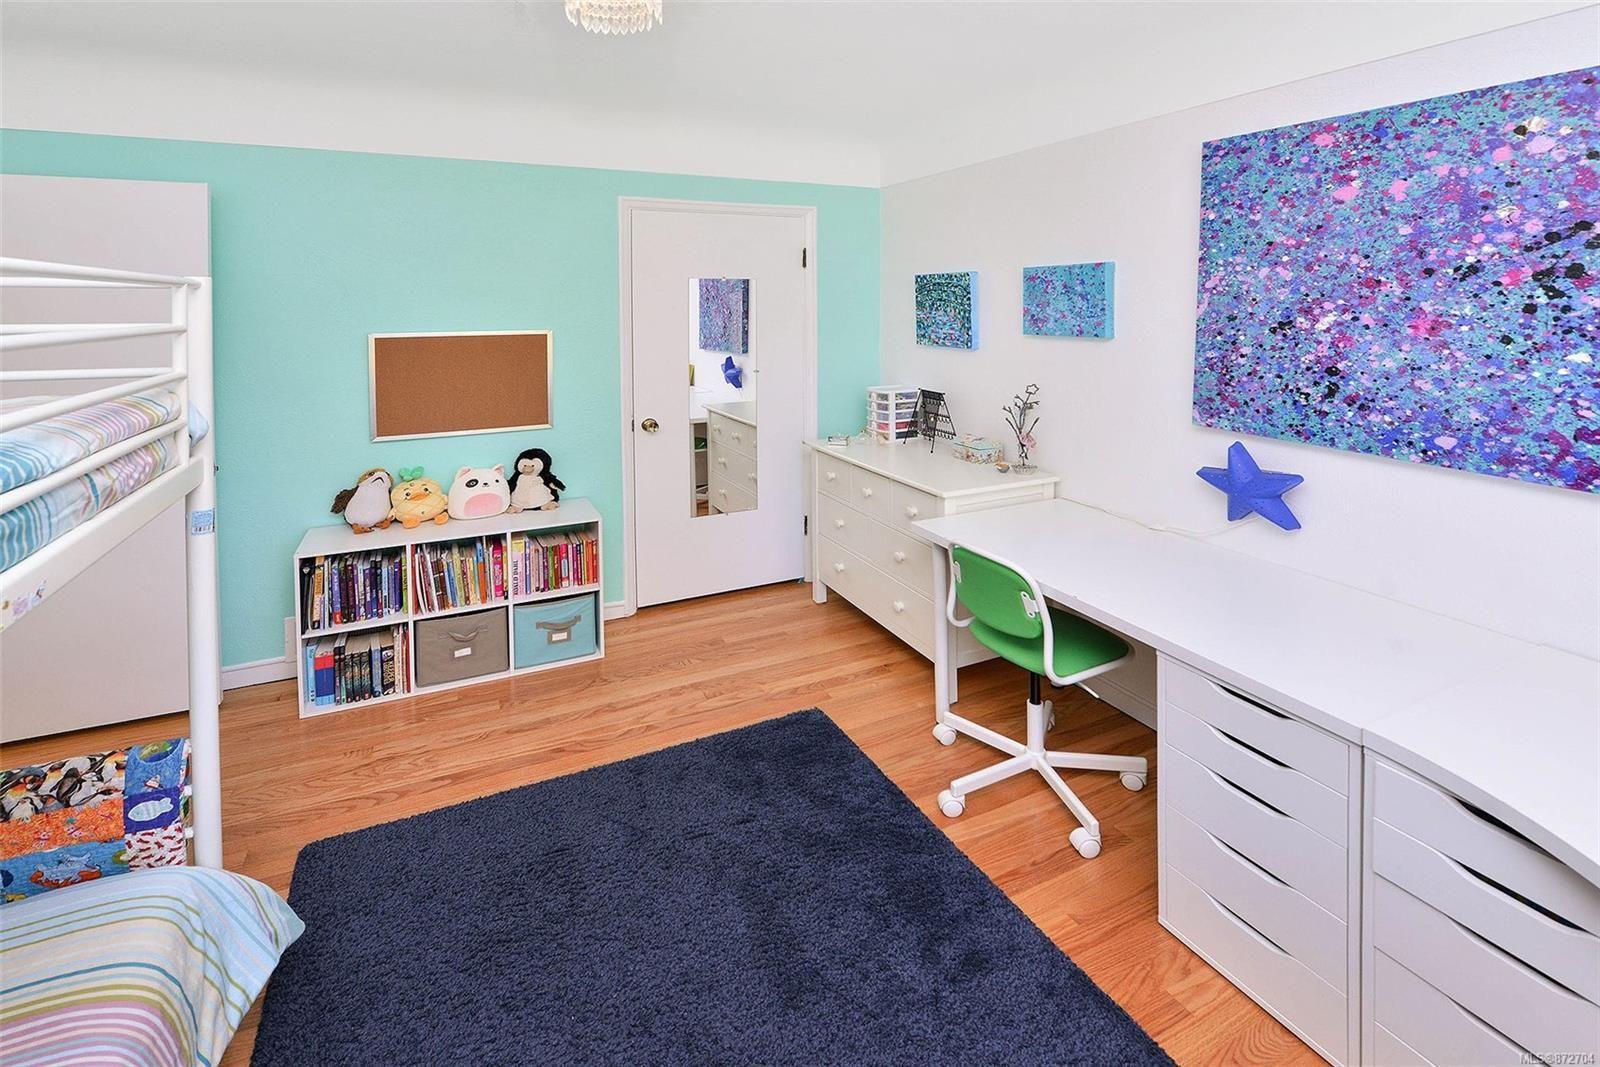 Photo 15: Photos: 2183 Sandowne Rd in : OB Henderson House for sale (Oak Bay)  : MLS®# 872704